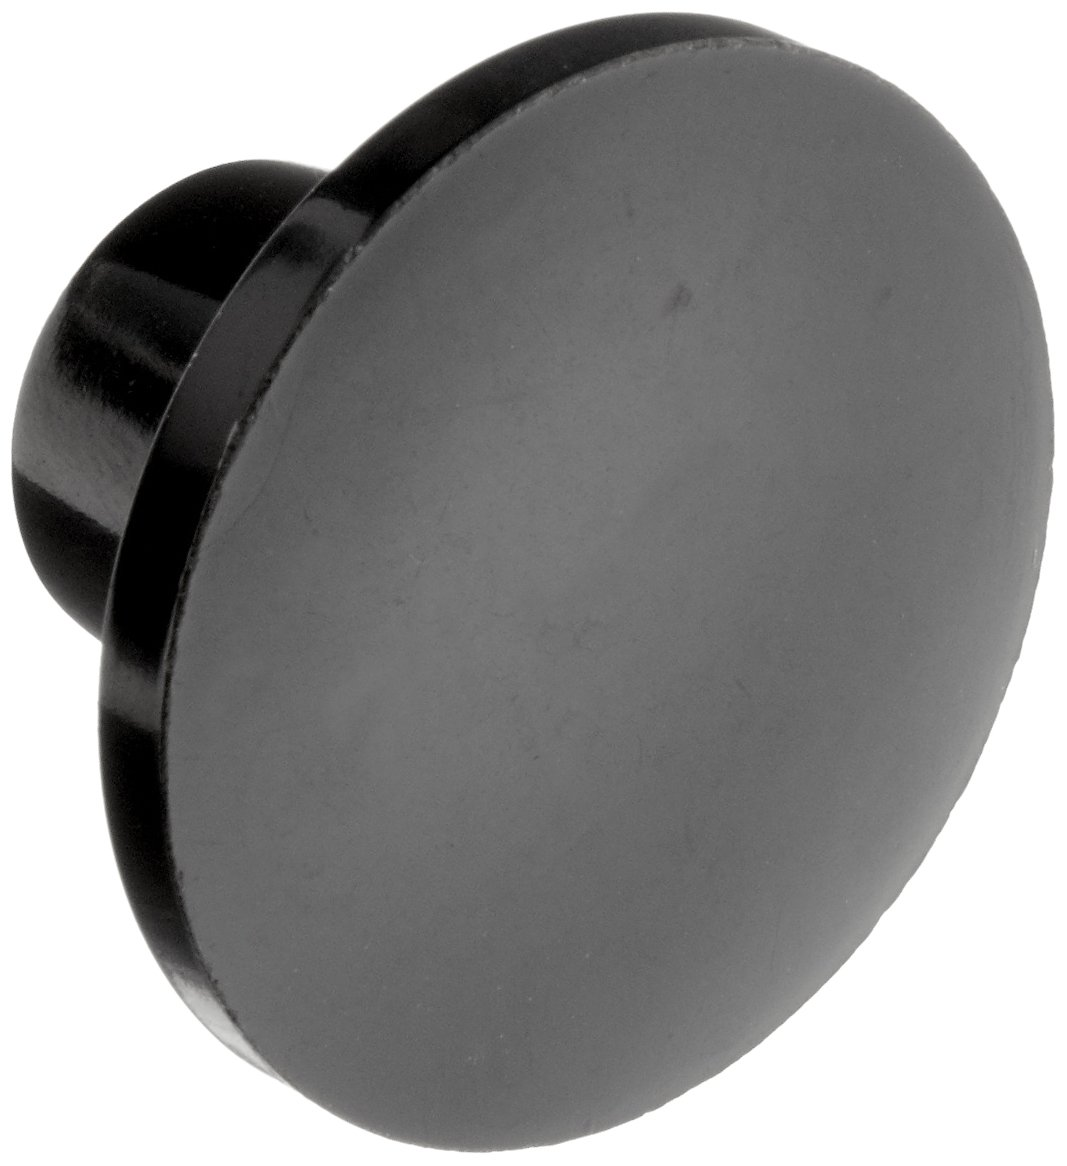 DimcoGray Black Phenolic Push-Pull Knob Female, Brass Insert: 5/16-18'' Thread x 7/16'' Depth, 1-3/8'' Diameter x 7/8'' Height x 5/8'' Hub Dia, 5/8 Hub Length (Pack of 10)